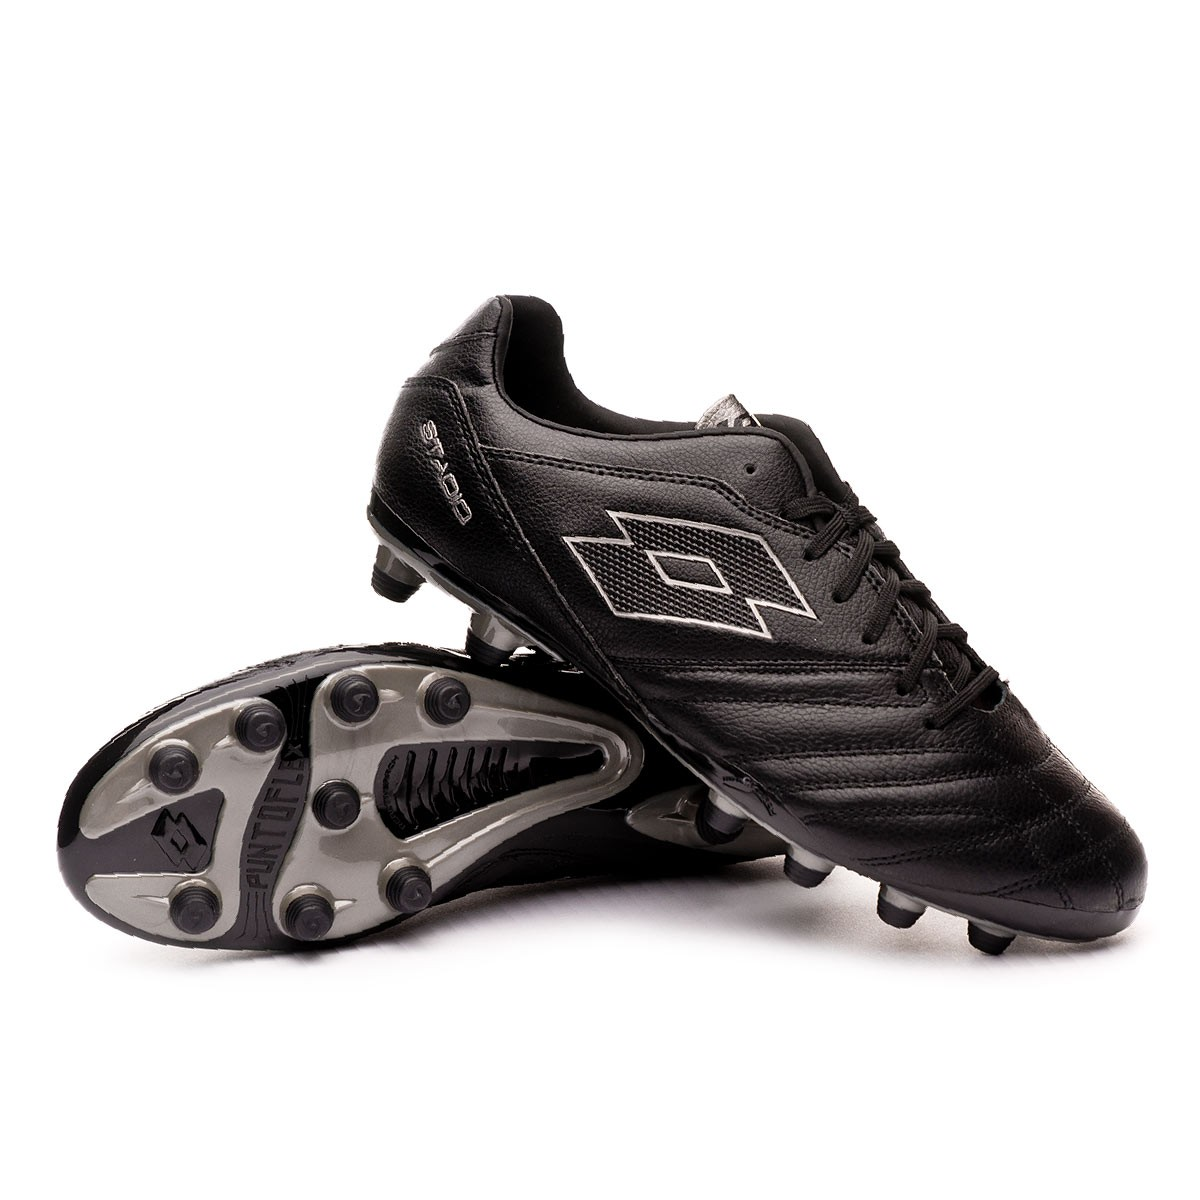 Football Boots Lotto Stadio 300 II FG